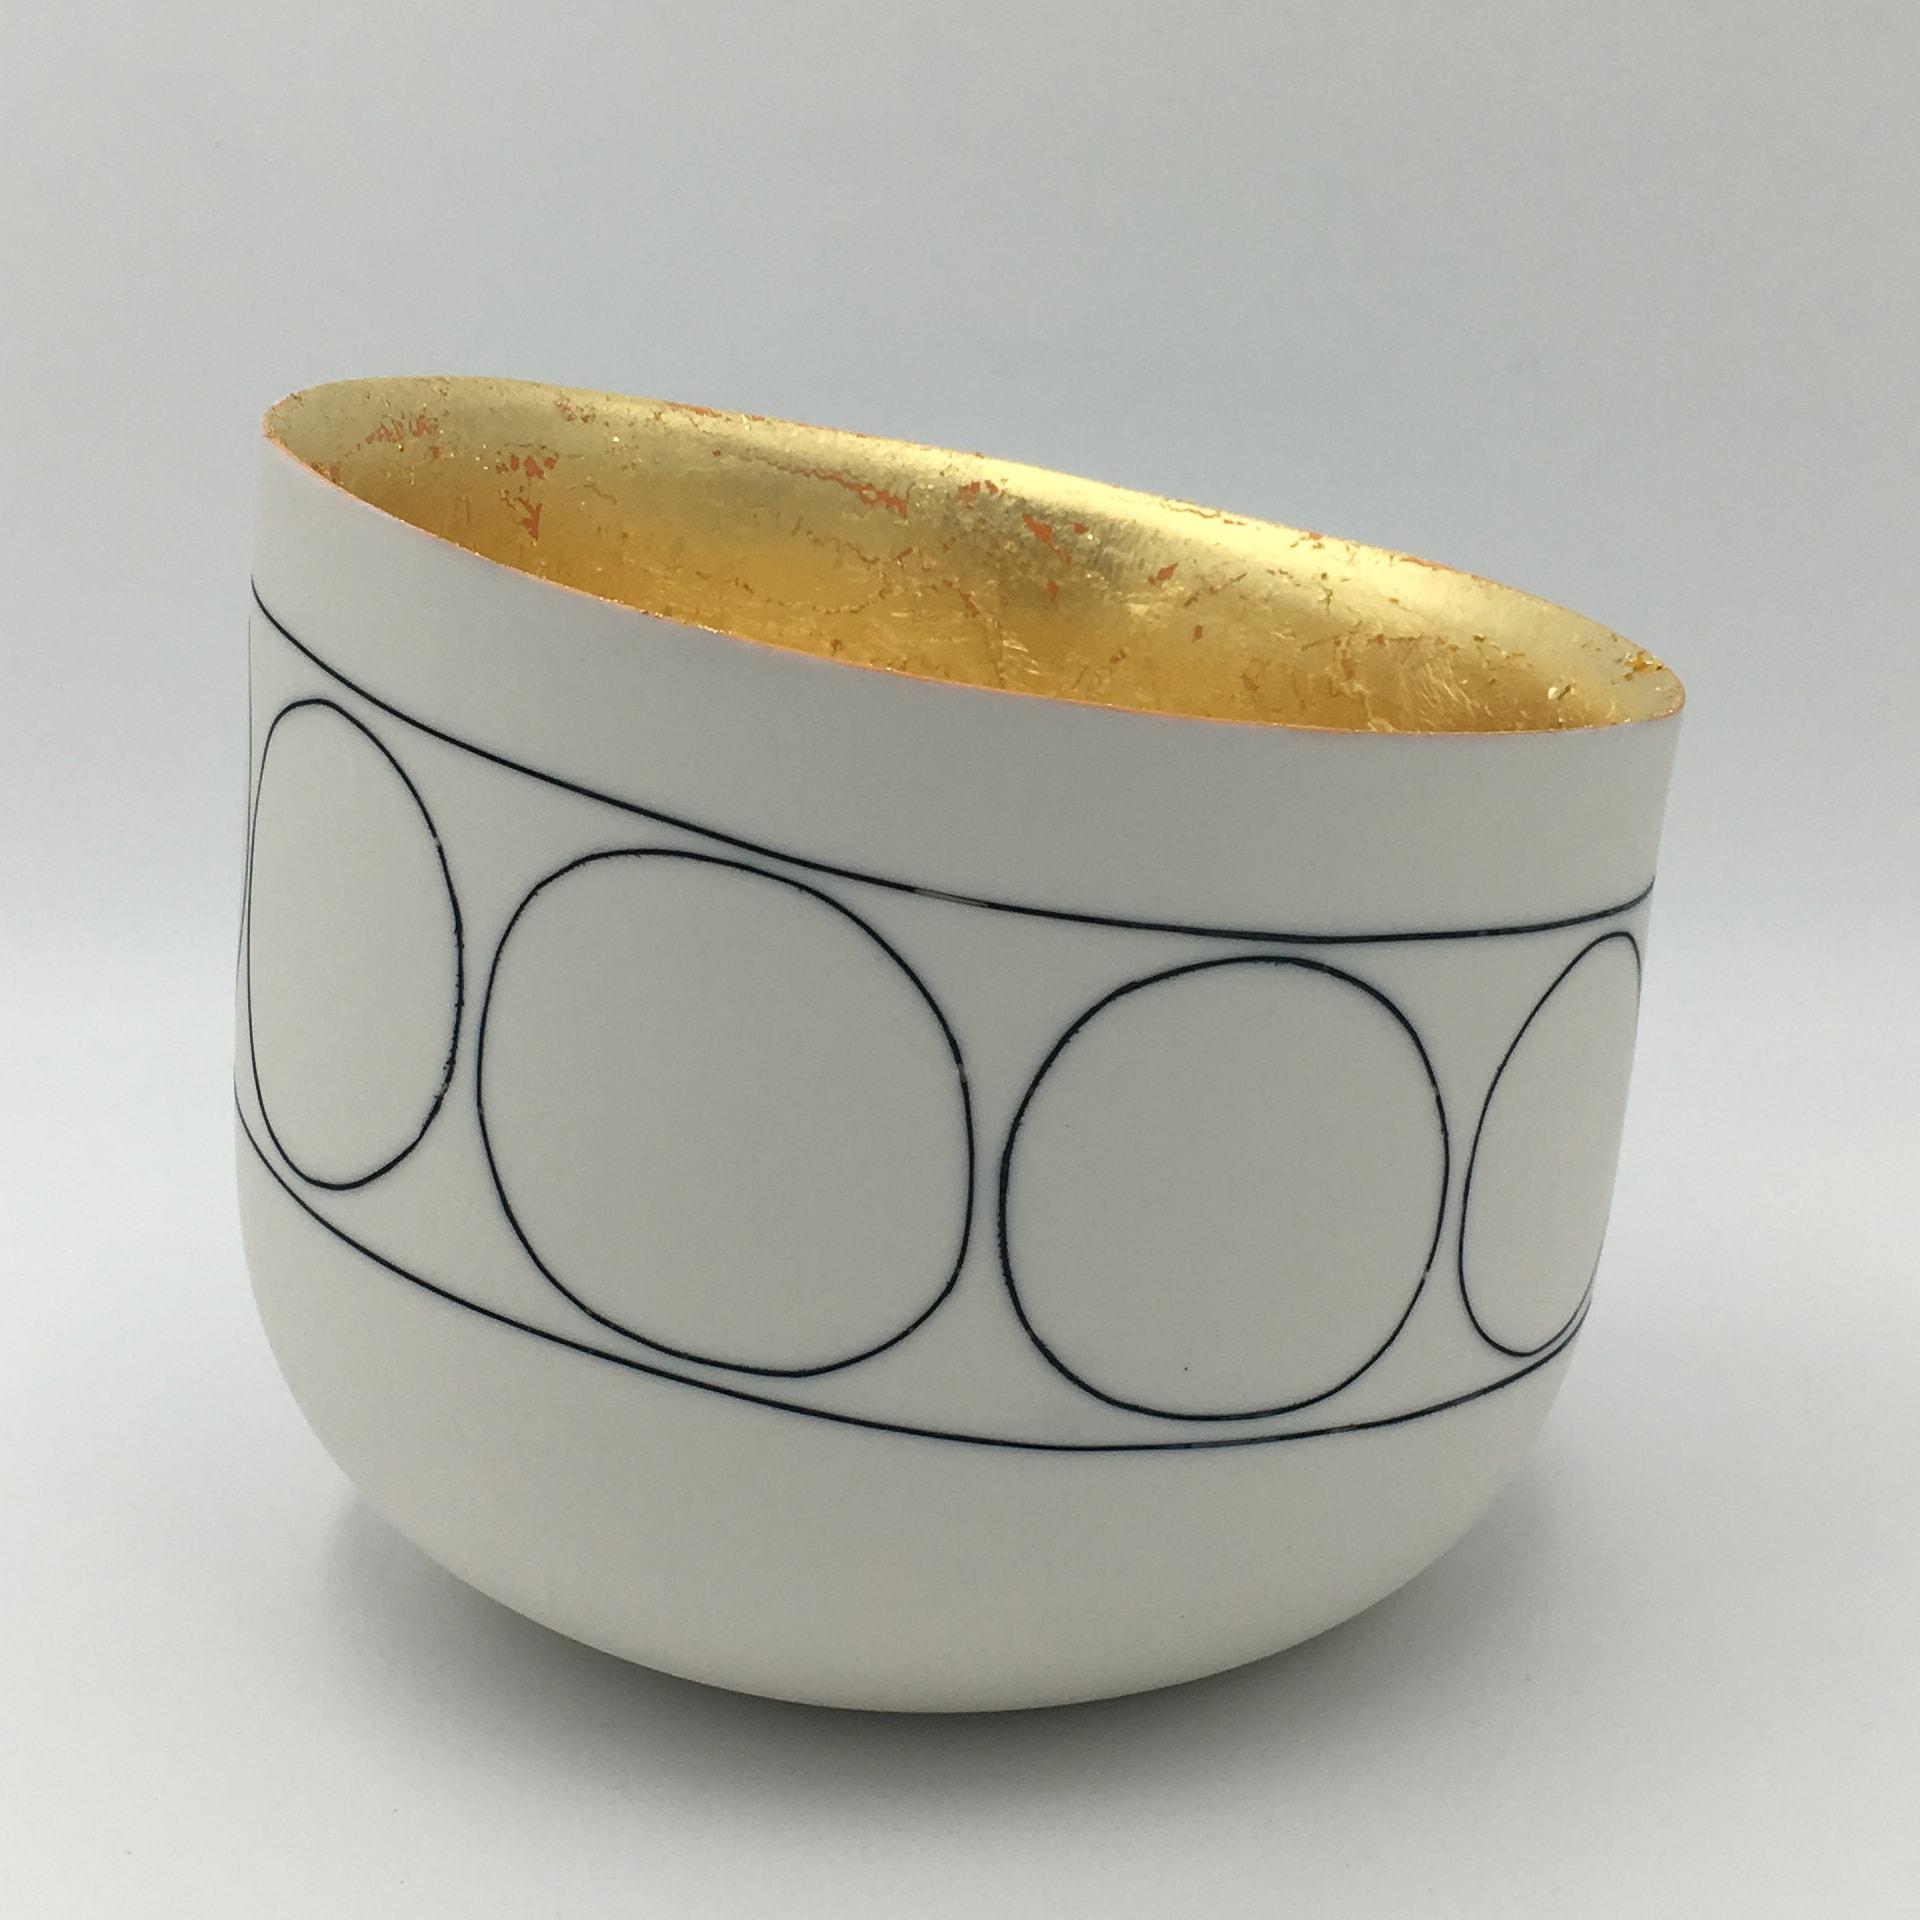 "<span class=""link fancybox-details-link""><a href=""/artists/195-lara-scobie/works/6517-lara-scobie-tilted-circle-bowl-with-23ct-gold-interior-2019/"">View Detail Page</a></span><div class=""artist""><strong>Lara Scobie</strong></div> b. 1967 <div class=""title""><em>Tilted Circle Bowl with 23ct Gold Interior</em>, 2019</div> <div class=""medium"">Porcelain</div><div class=""copyright_line"">Own Art: £54 x 10 Months, 0% APR</div>"